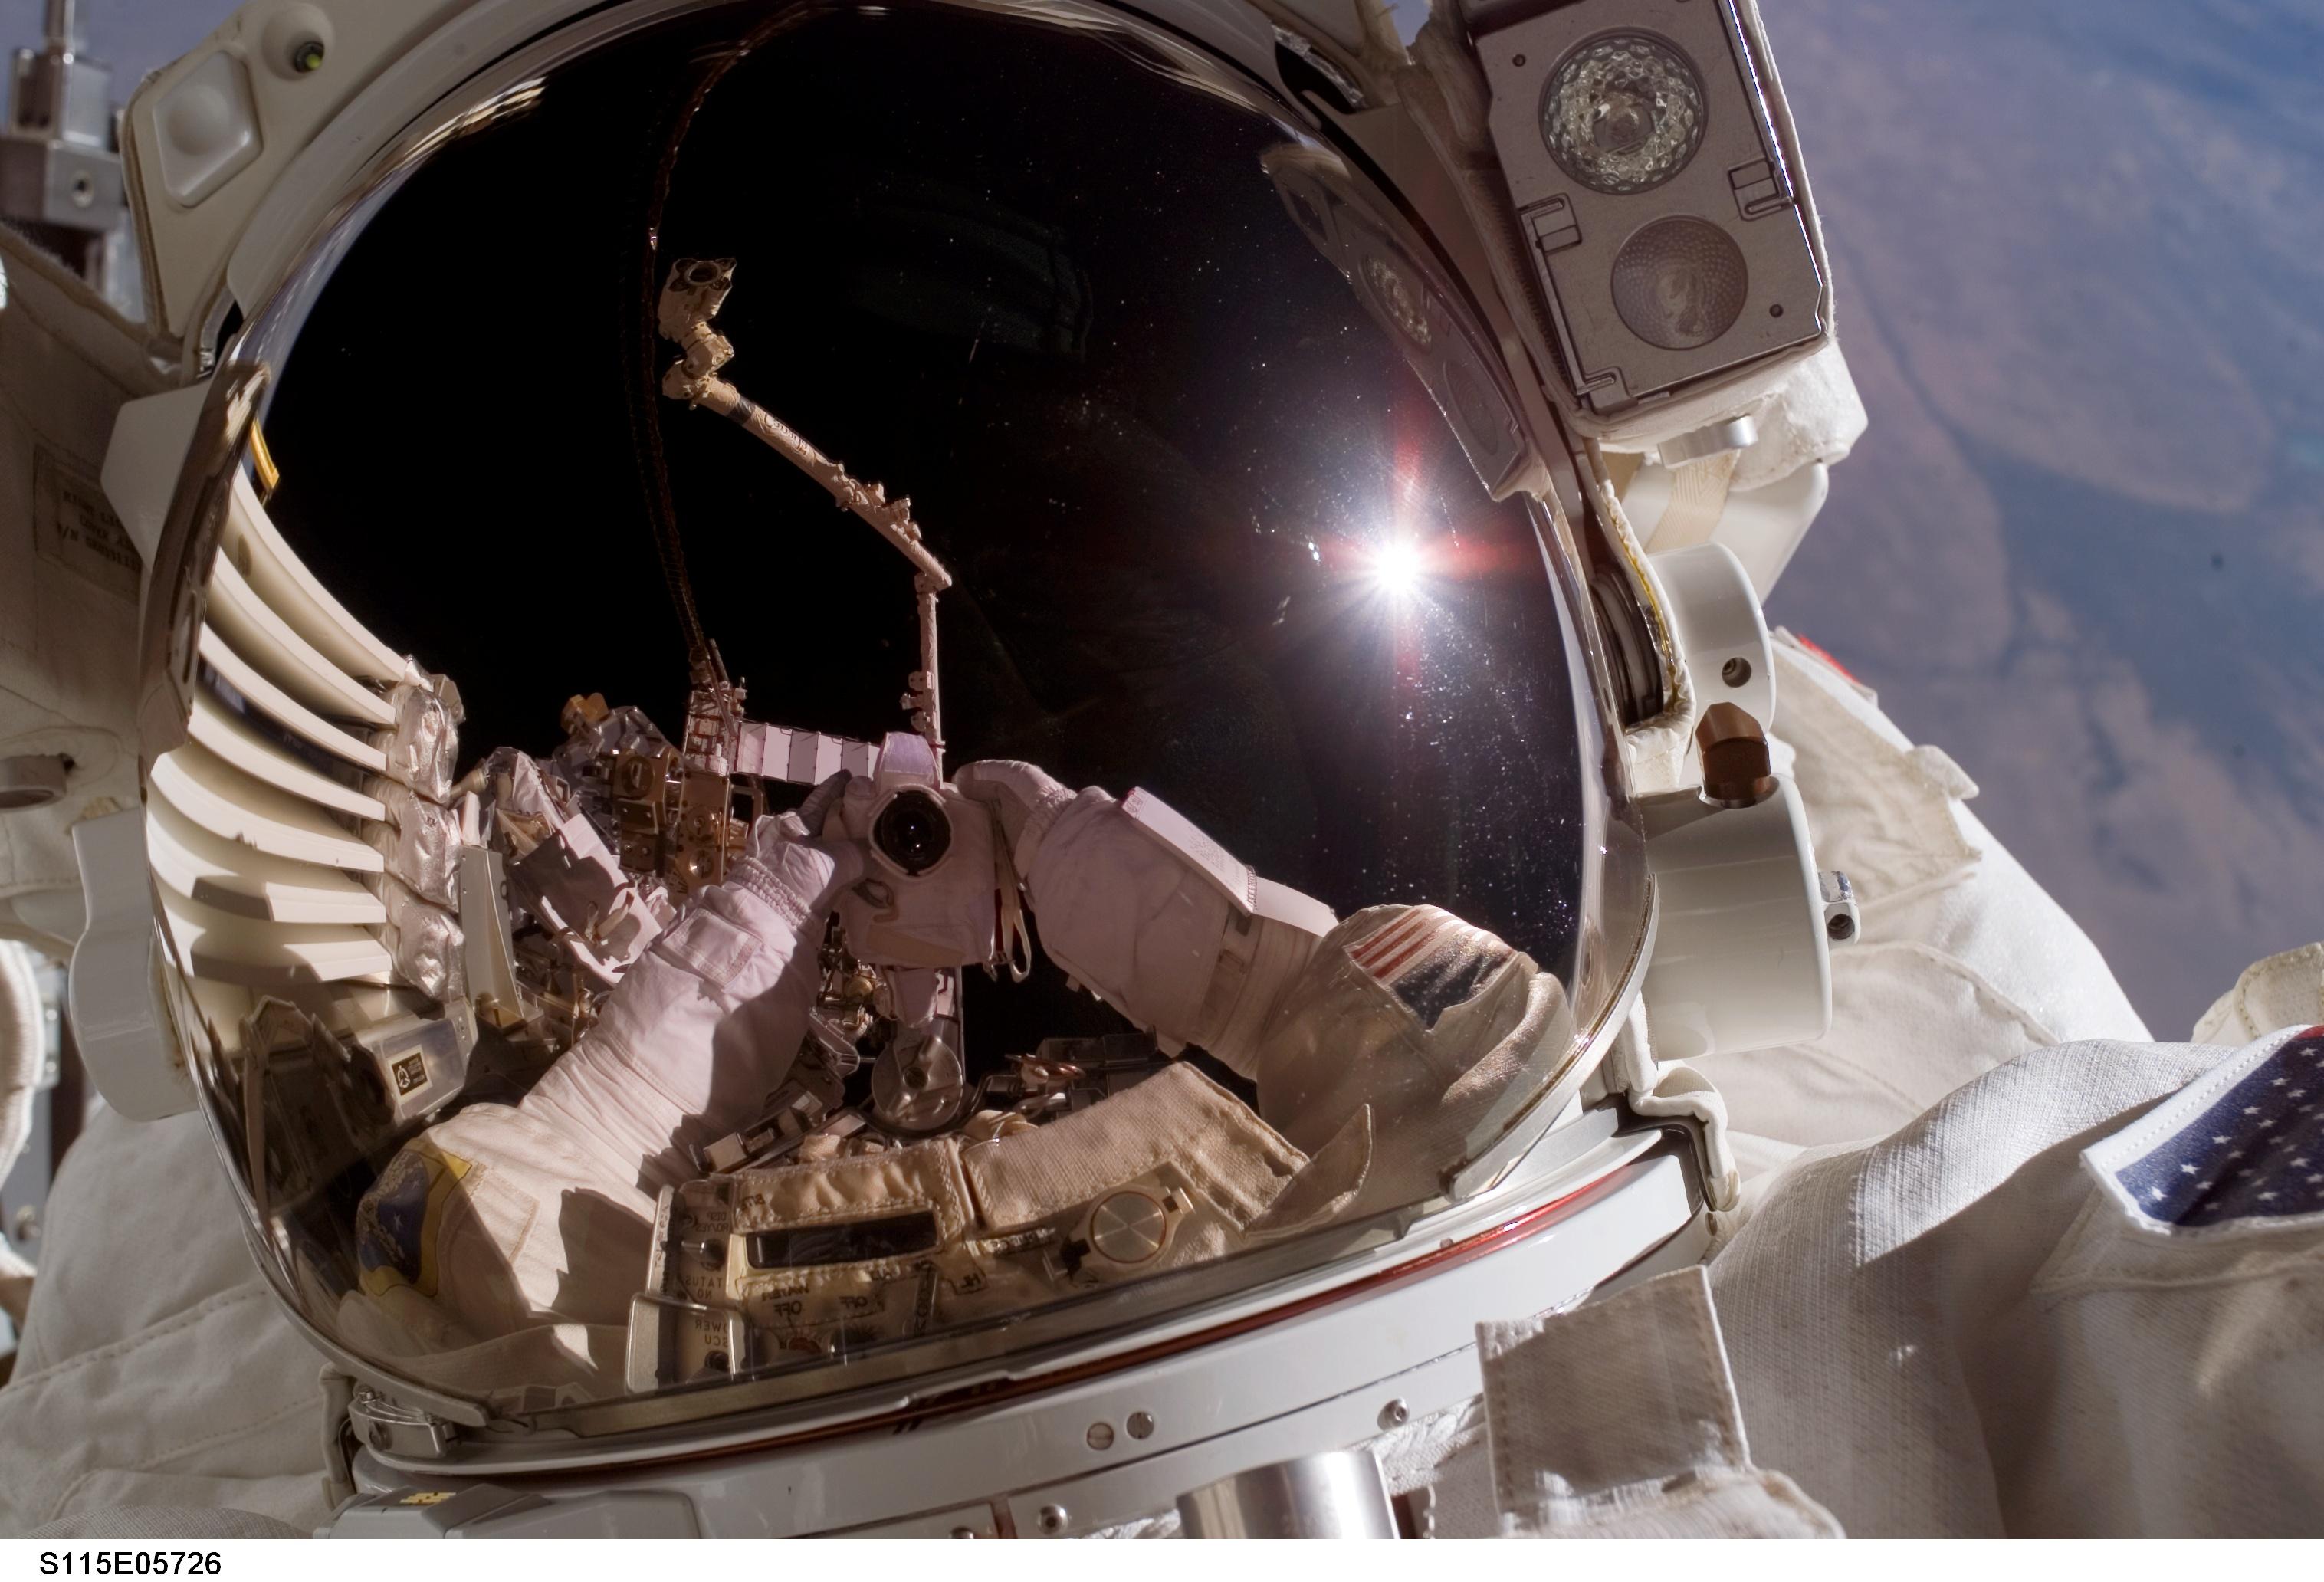 The Best Astronaut Selfies in Space